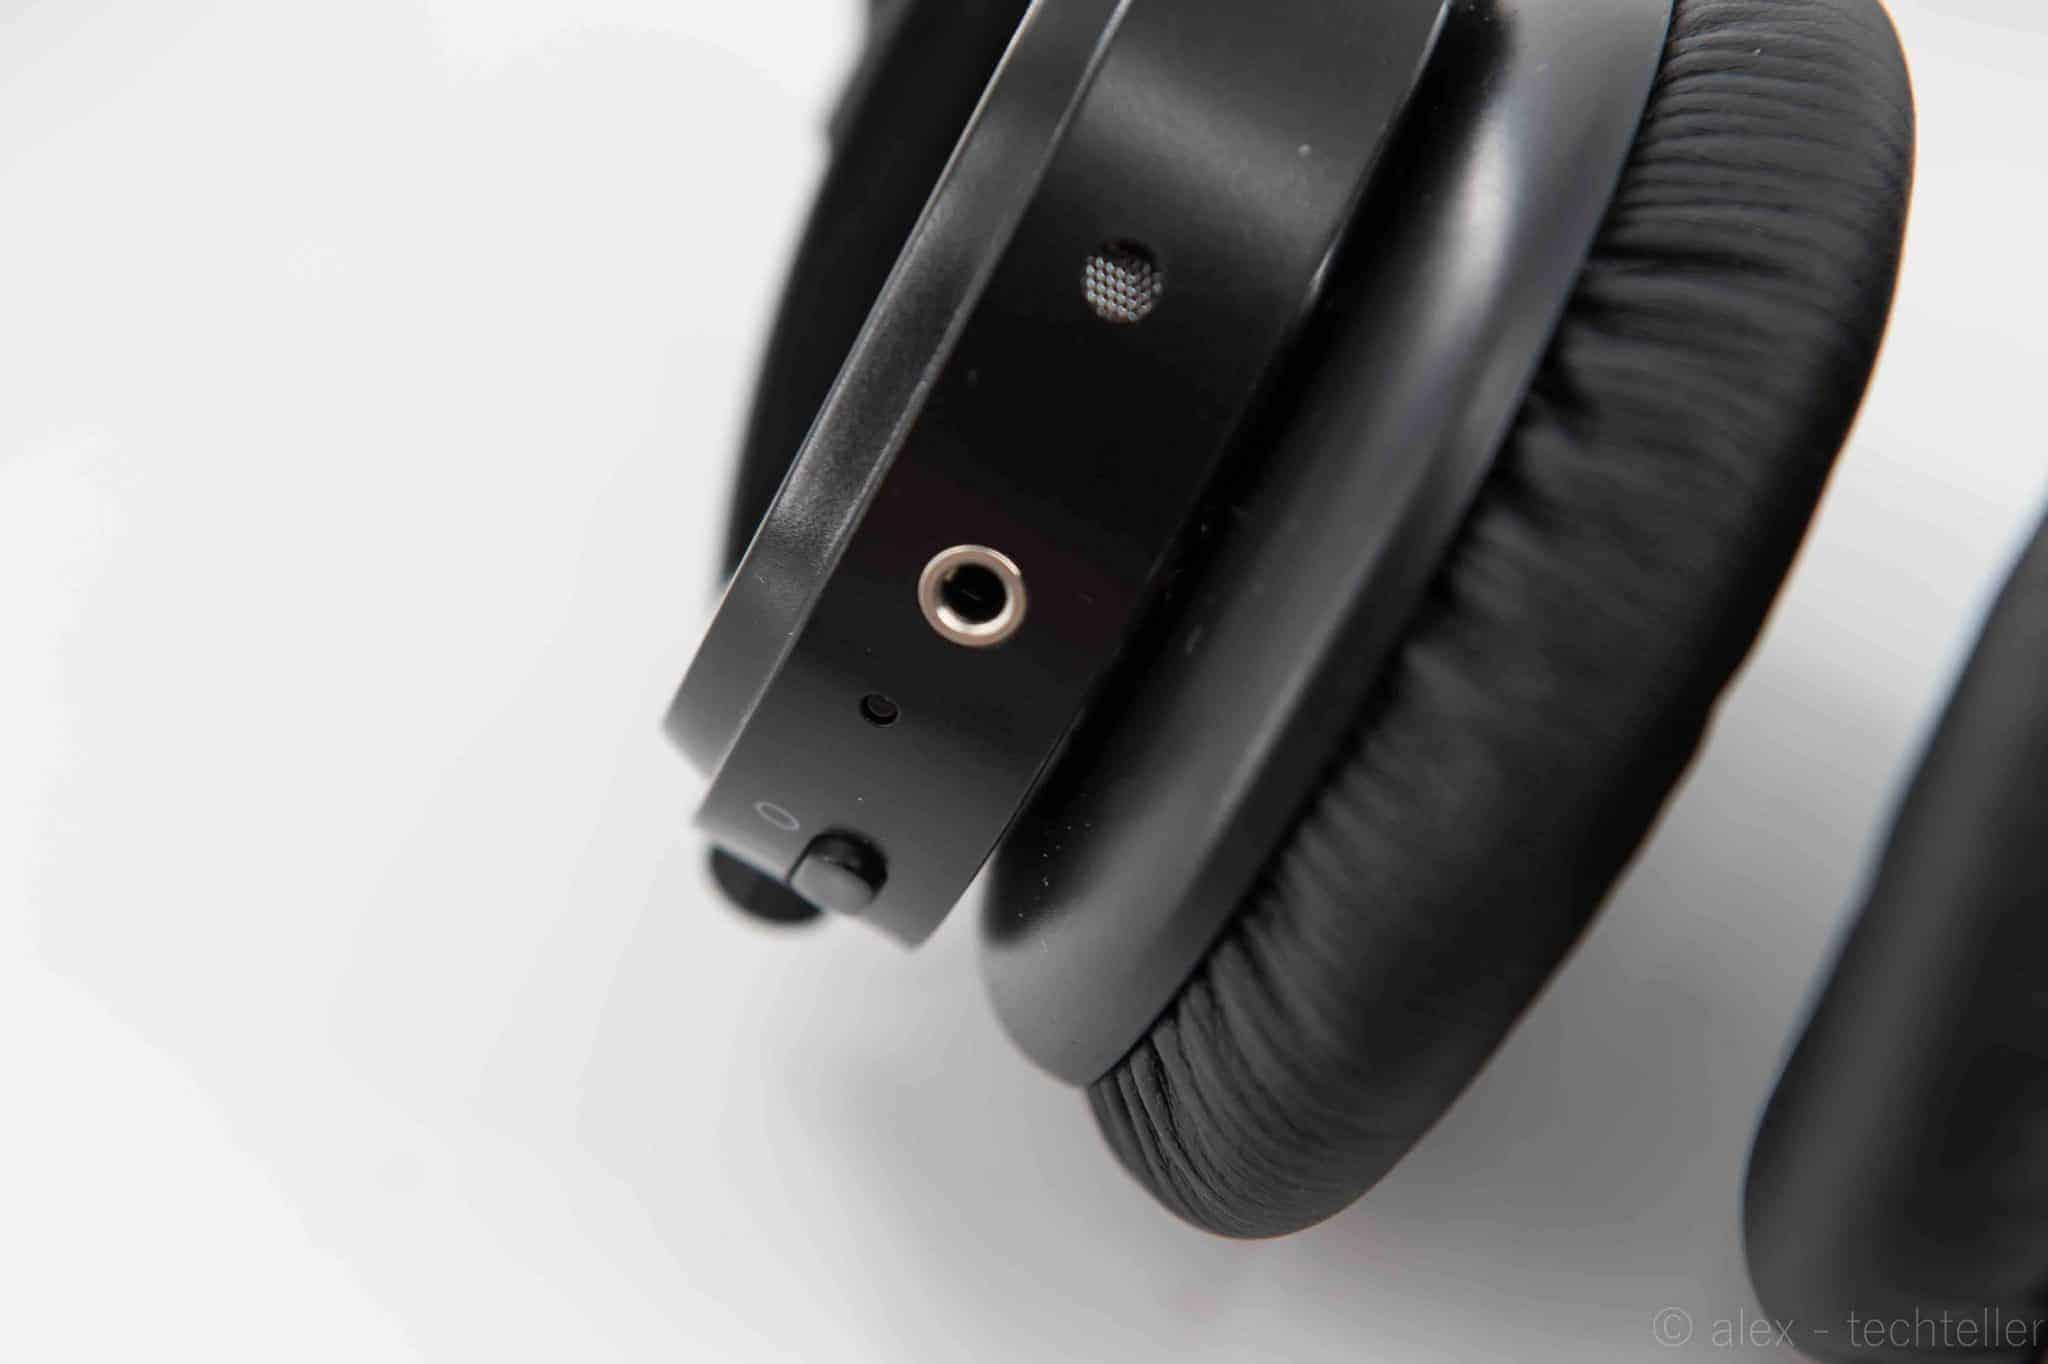 Taotronics TT-BH17 開箱評測 - 推薦高CP值高續航力 耳罩式藍牙耳機-TechTeller (科技說)